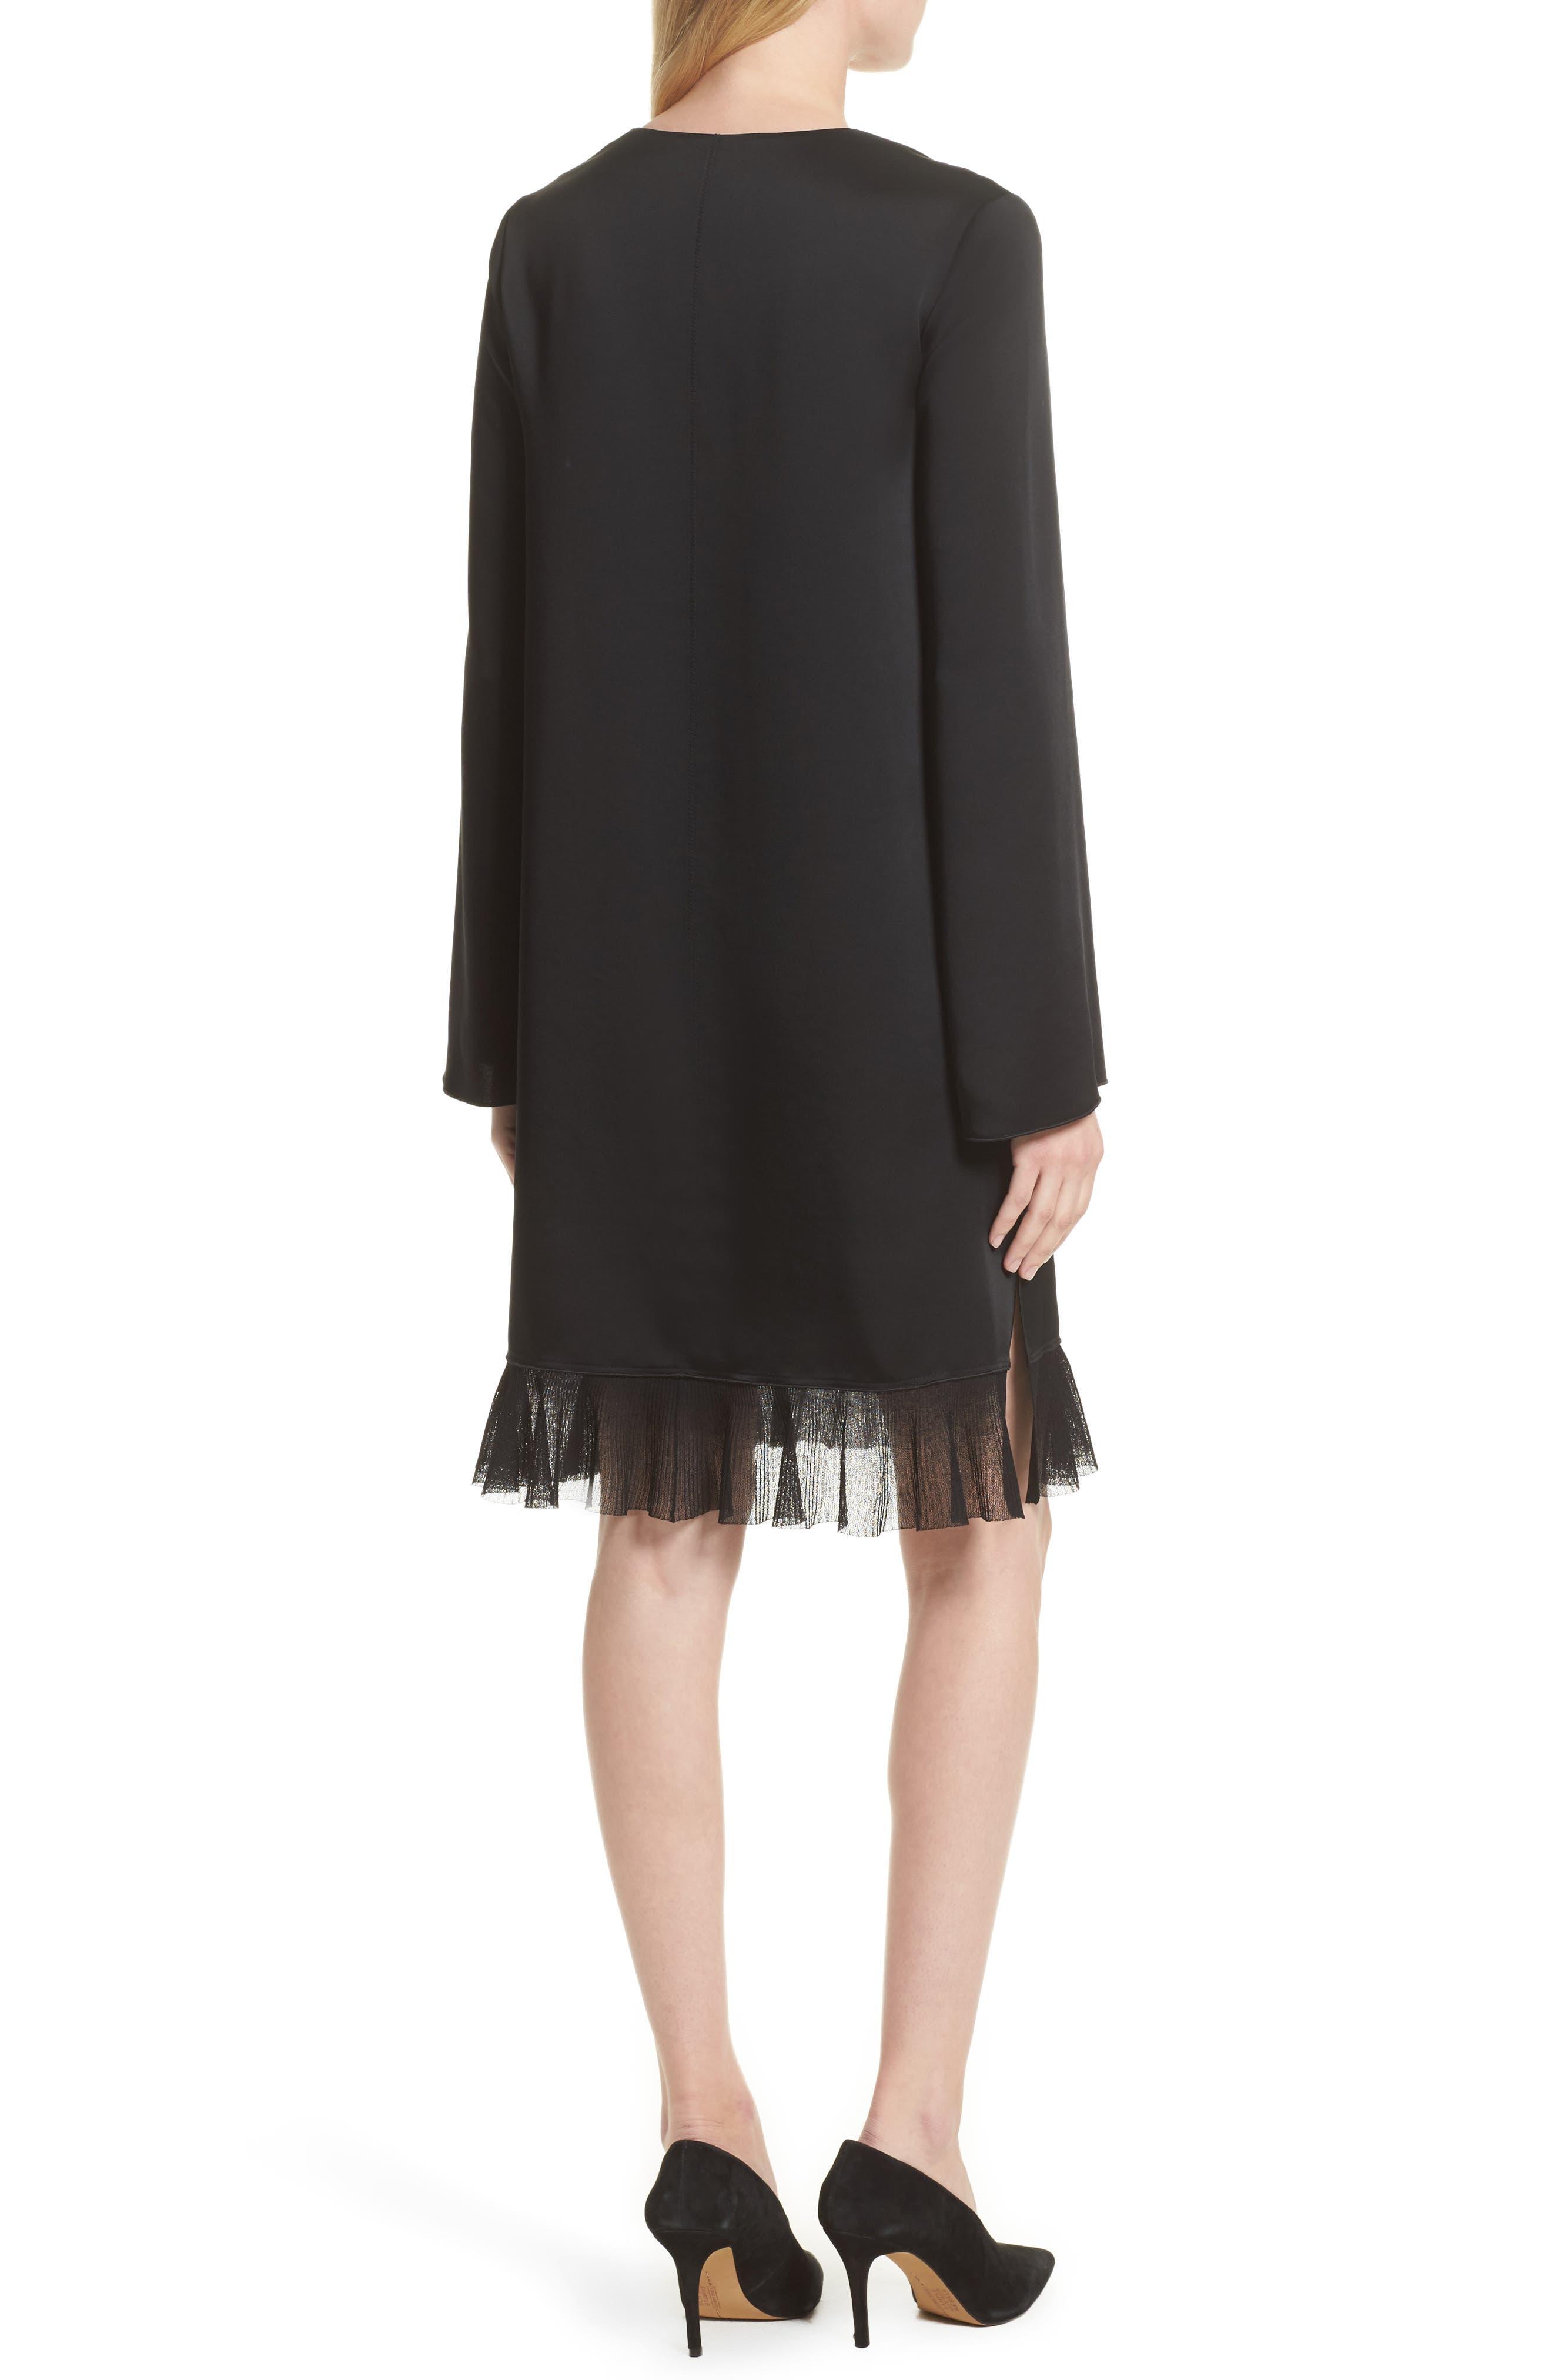 Heath Shift Dress,                             Alternate thumbnail 2, color,                             Black